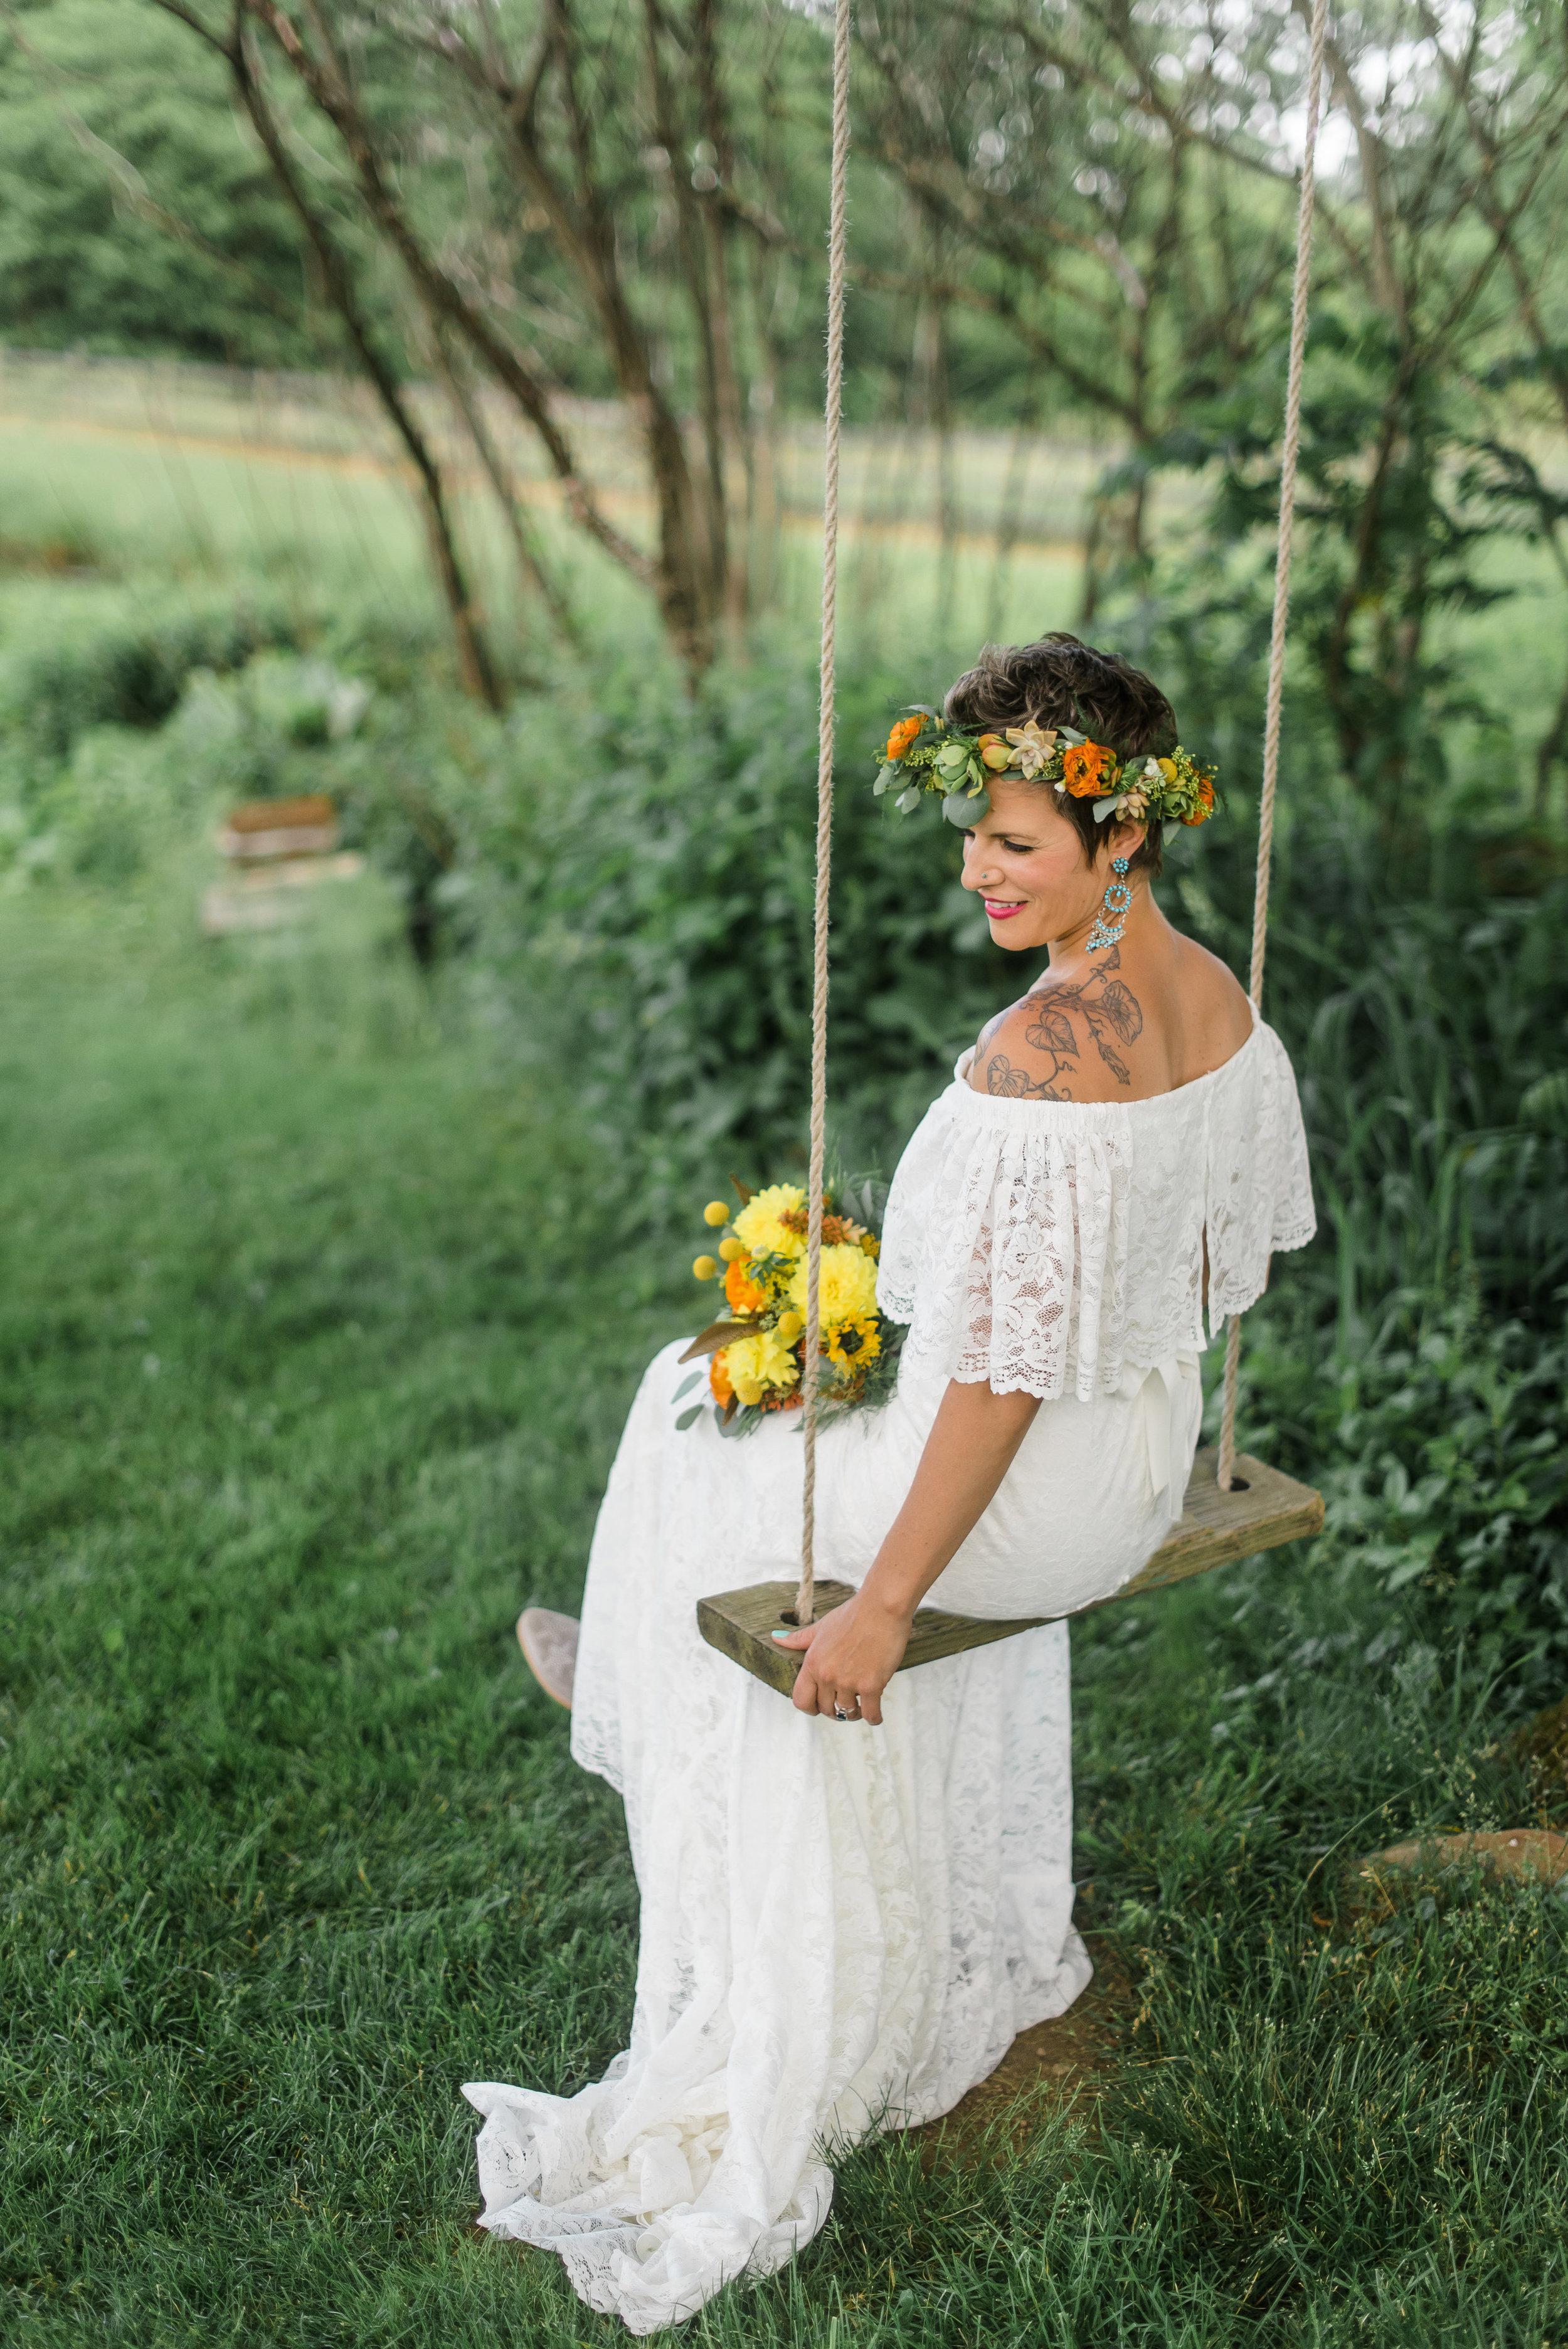 pittsburgh-wedding-photographer-armstrongfarms-eclectic-offbeat-boho0145.jpg